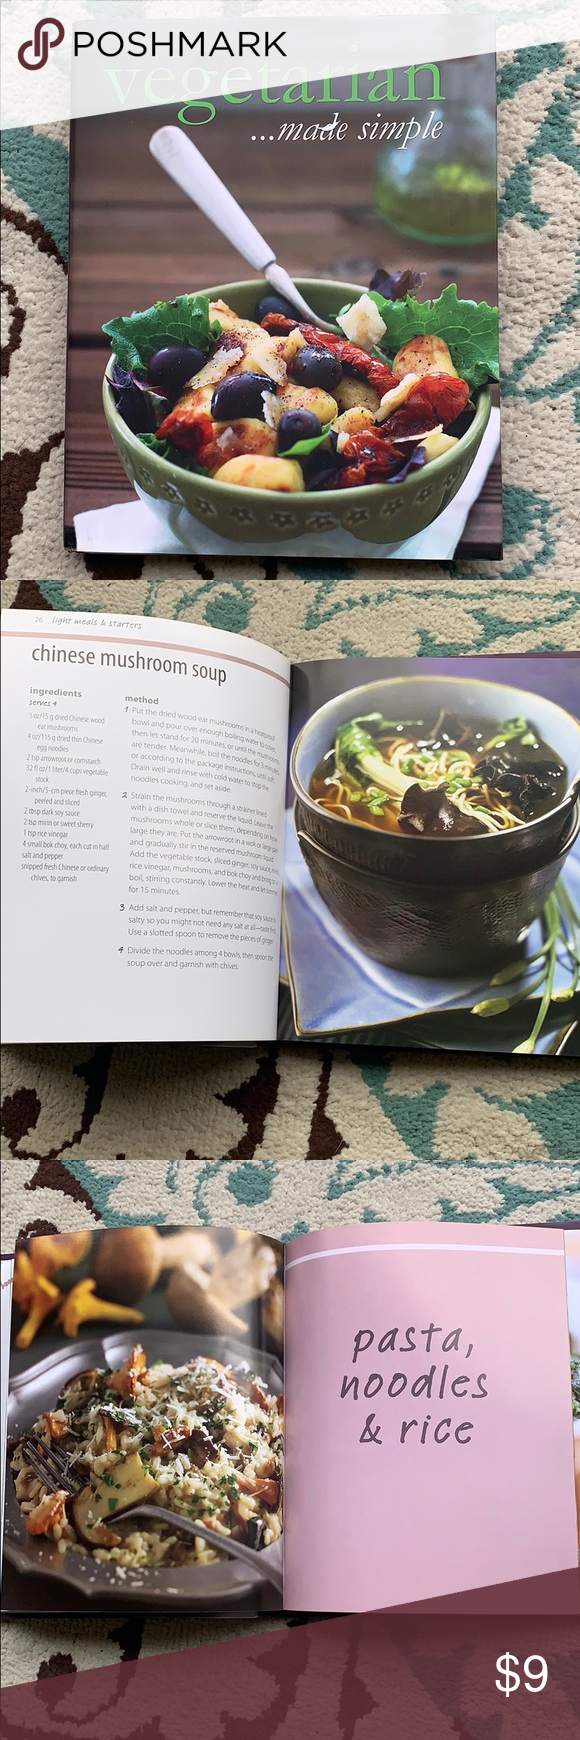 Vegetarian Cookbook In 2020 Vegetarian Cookbook Vegetarian Easy Meals